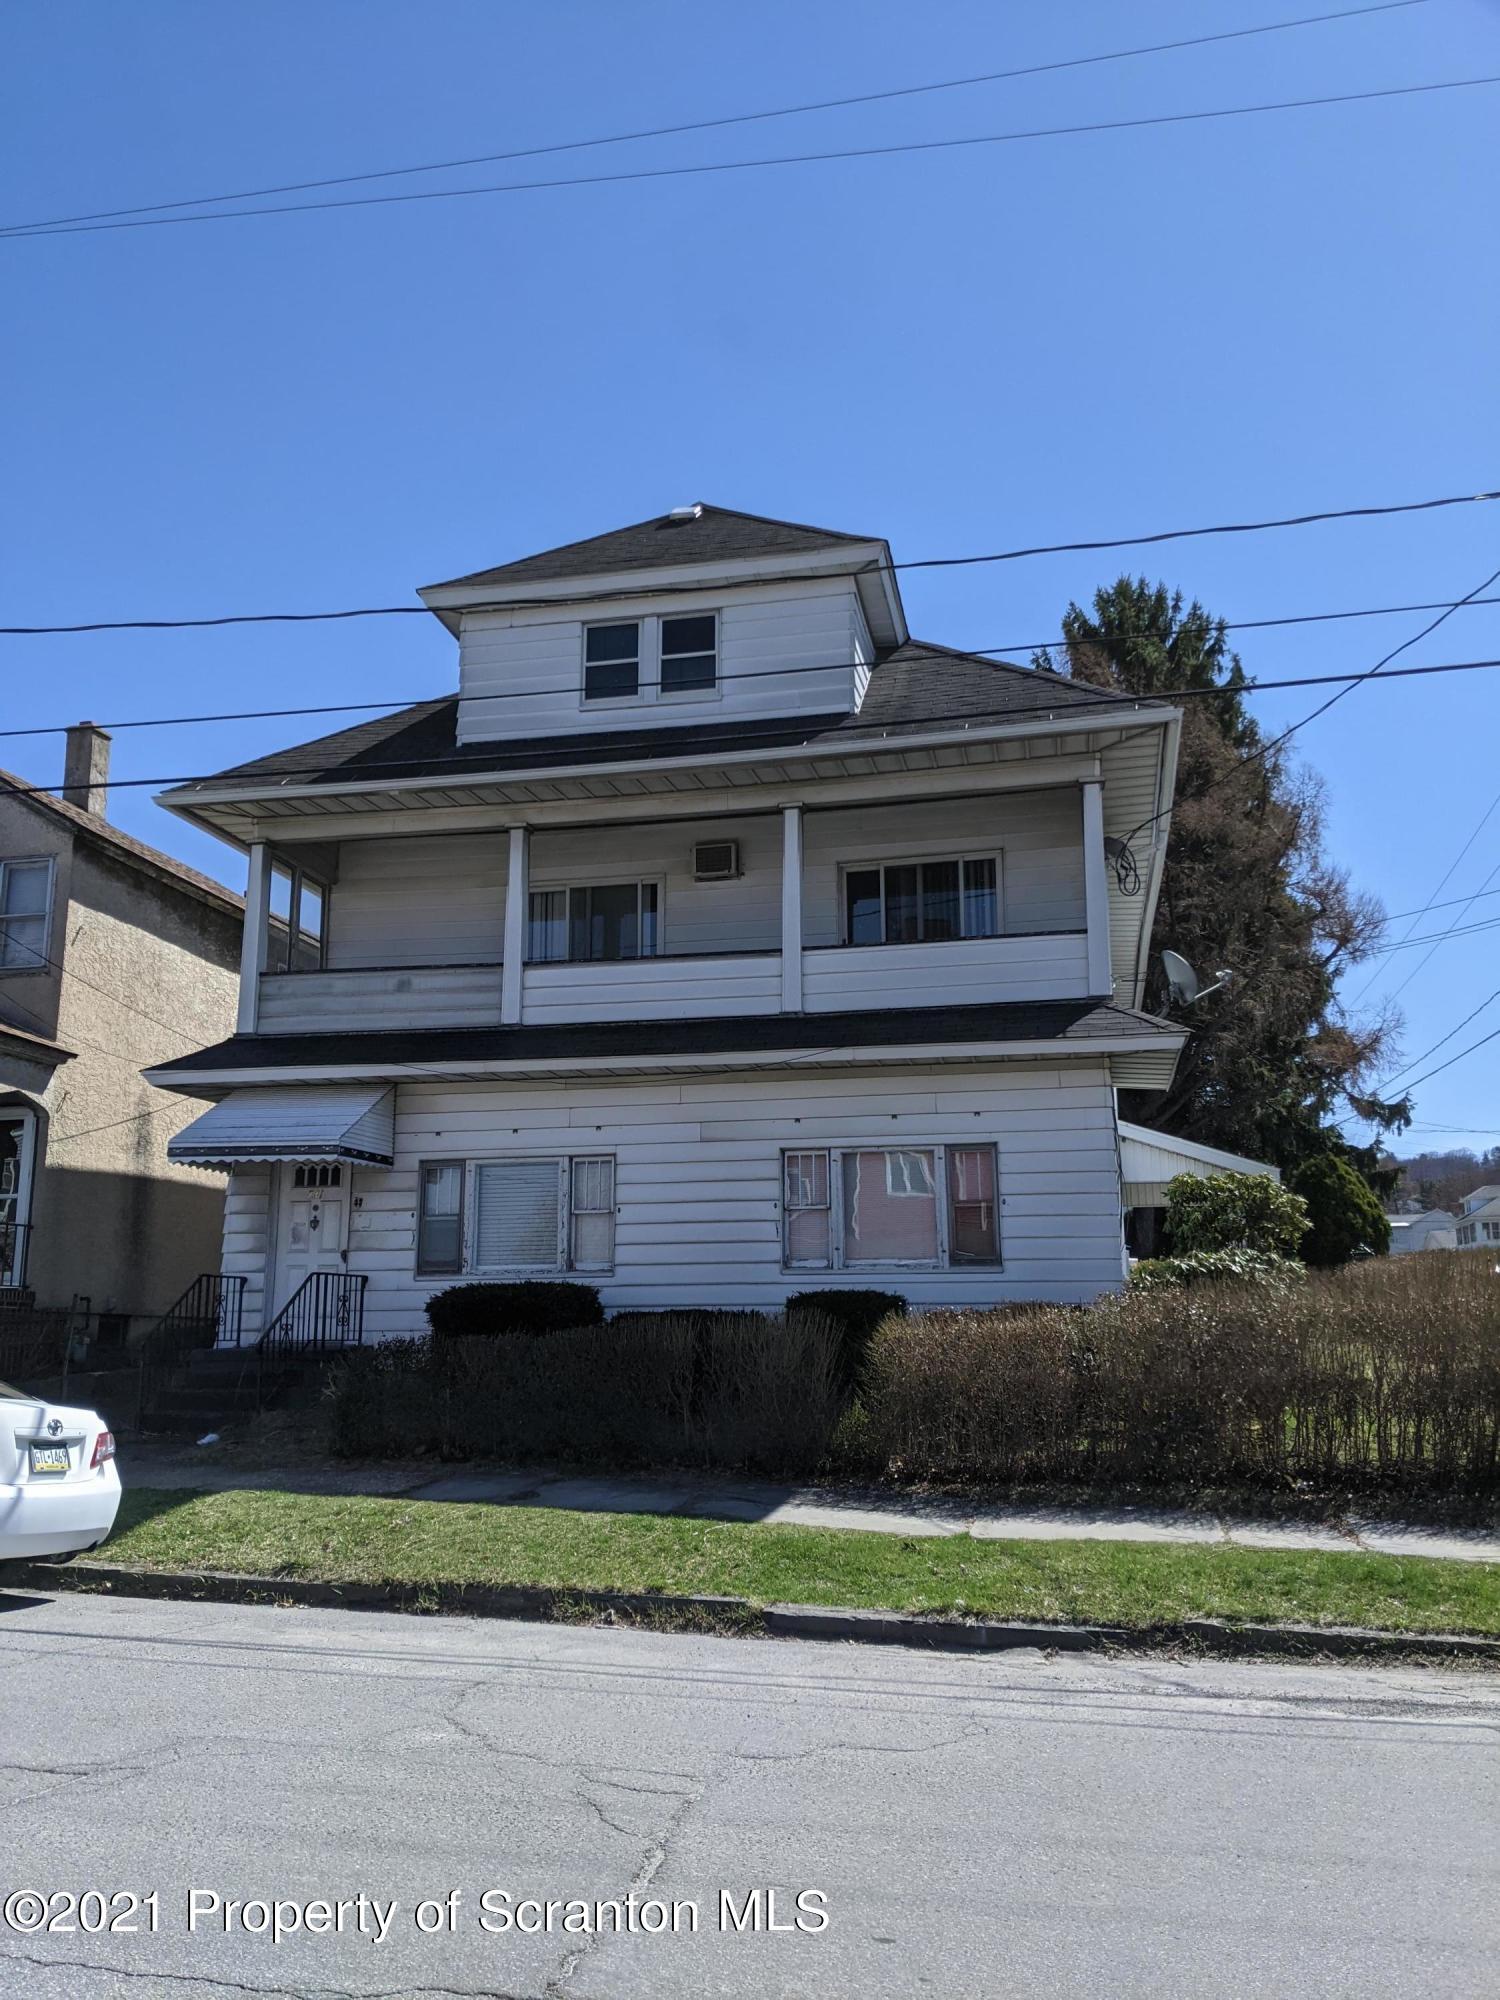 731 Irving Ave, Scranton, Pennsylvania 18505, 2 Bedrooms Bedrooms, 4 Rooms Rooms,1 BathroomBathrooms,Rental,For Lease,Irving,21-1186